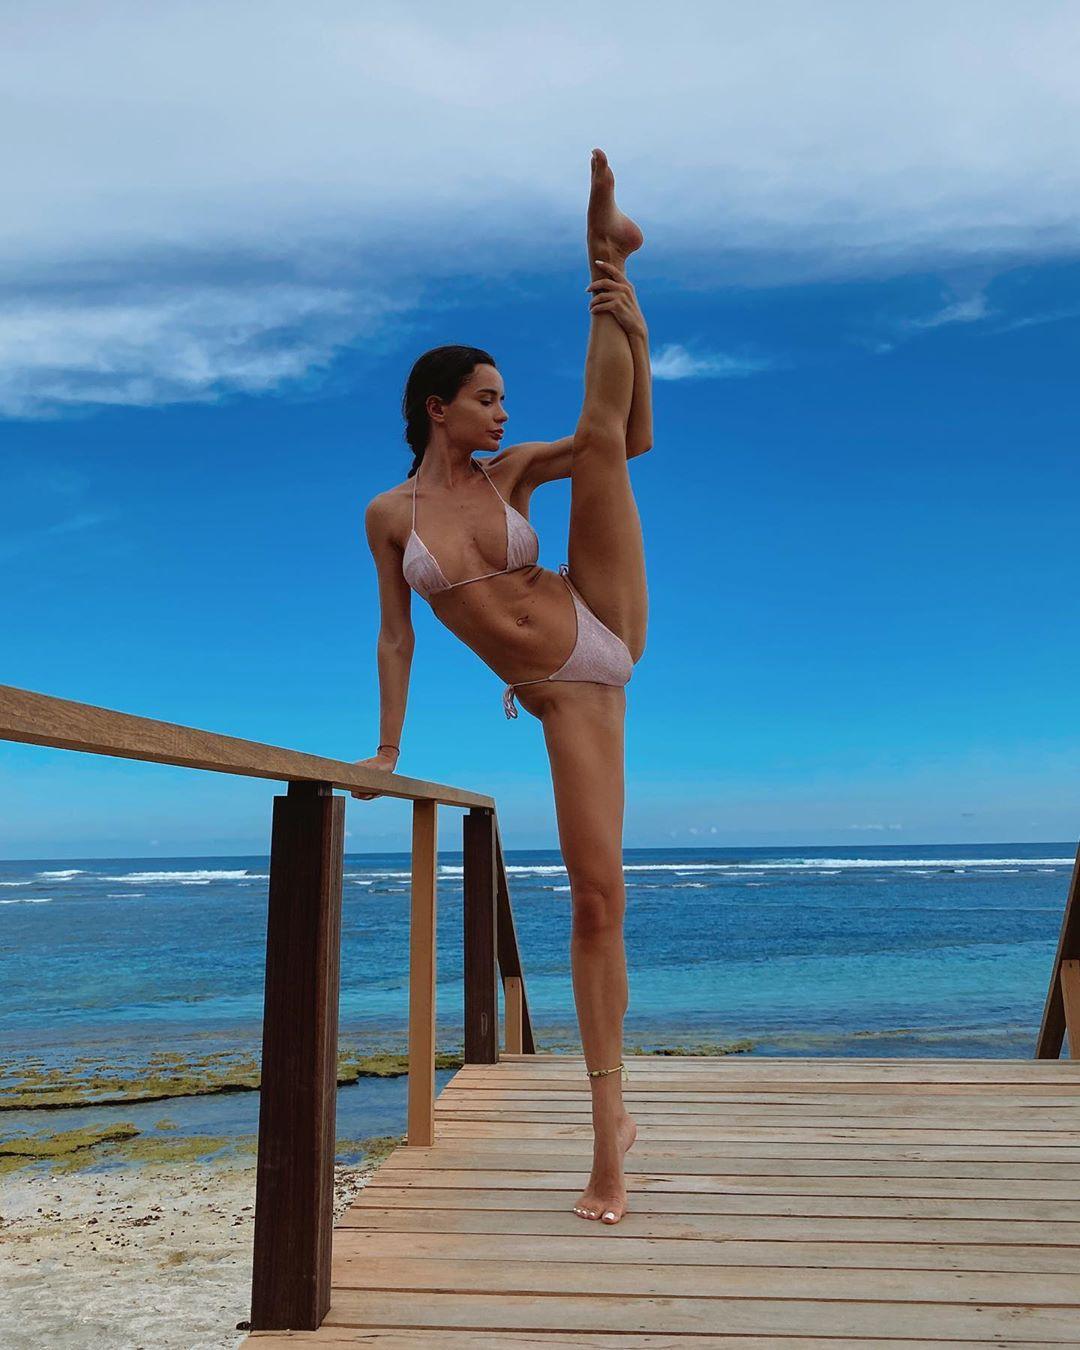 Ekaterina Zueva legs pic, body muscle, having fun